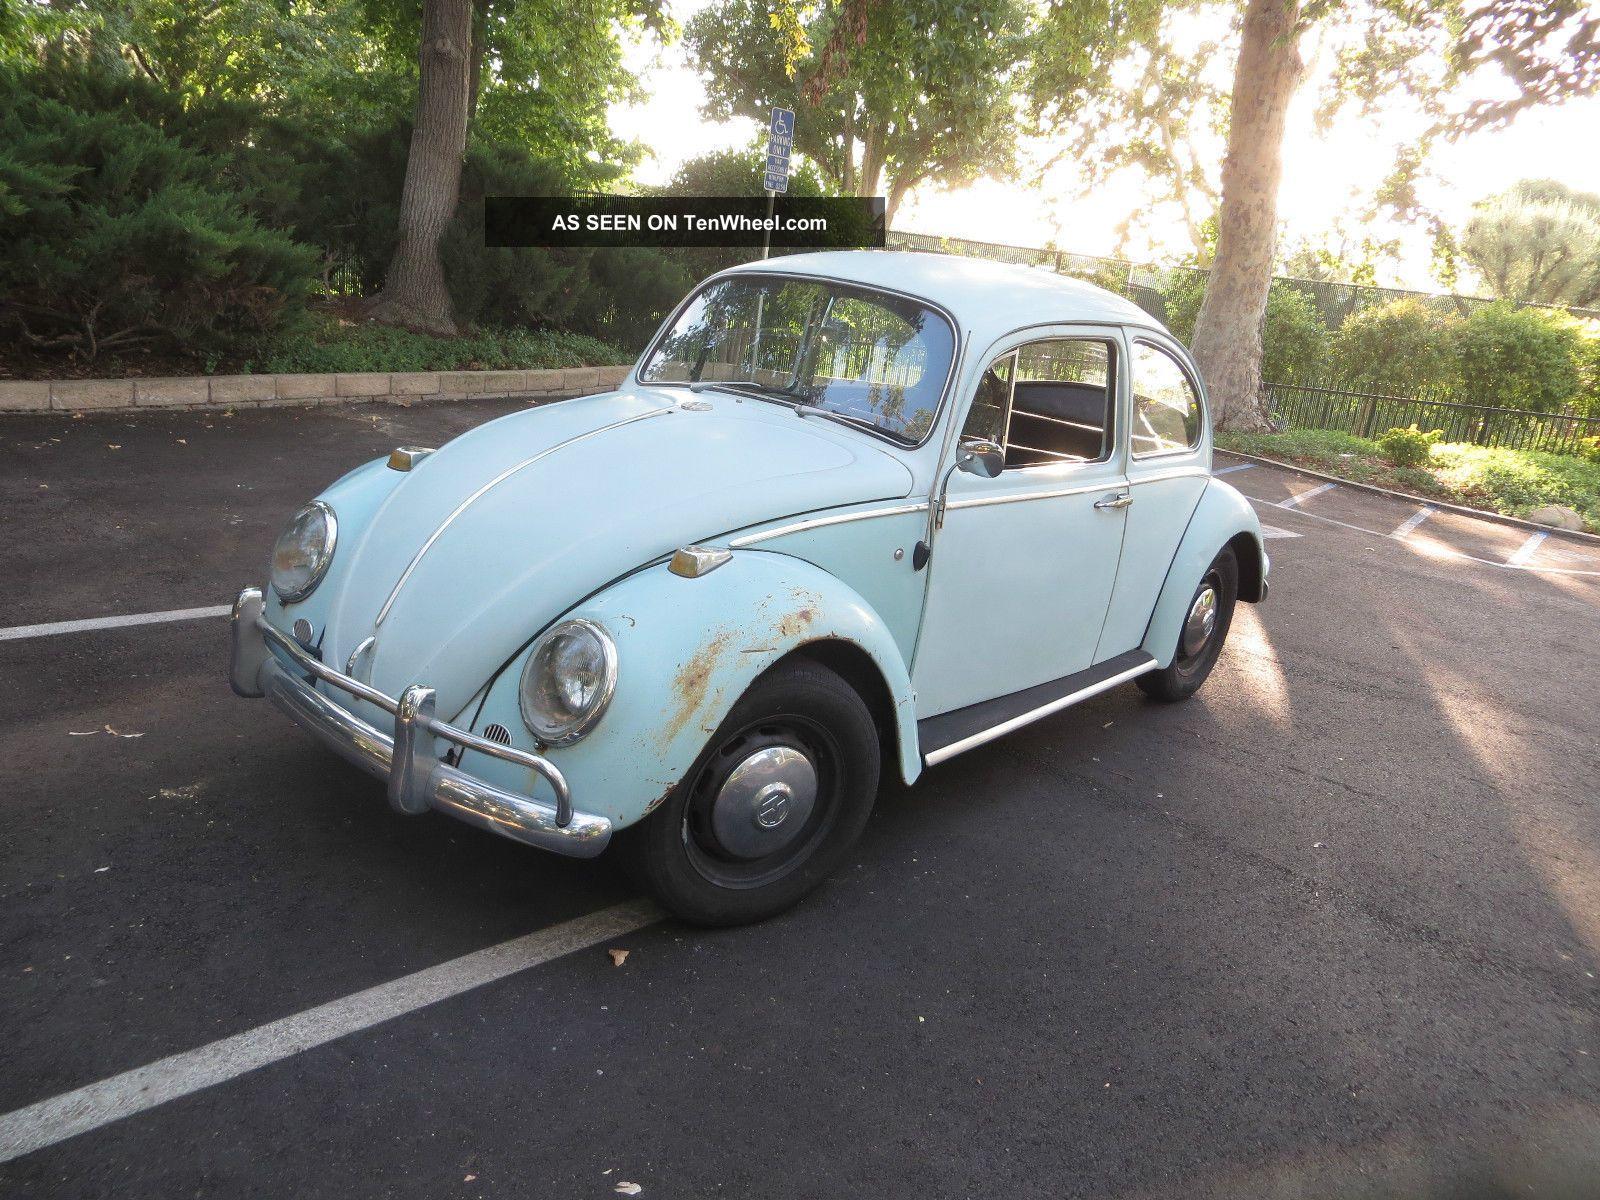 Classic Vw Beetle Bug Bahama Blue Coupe 1966 Classic Beetle - Classic photo